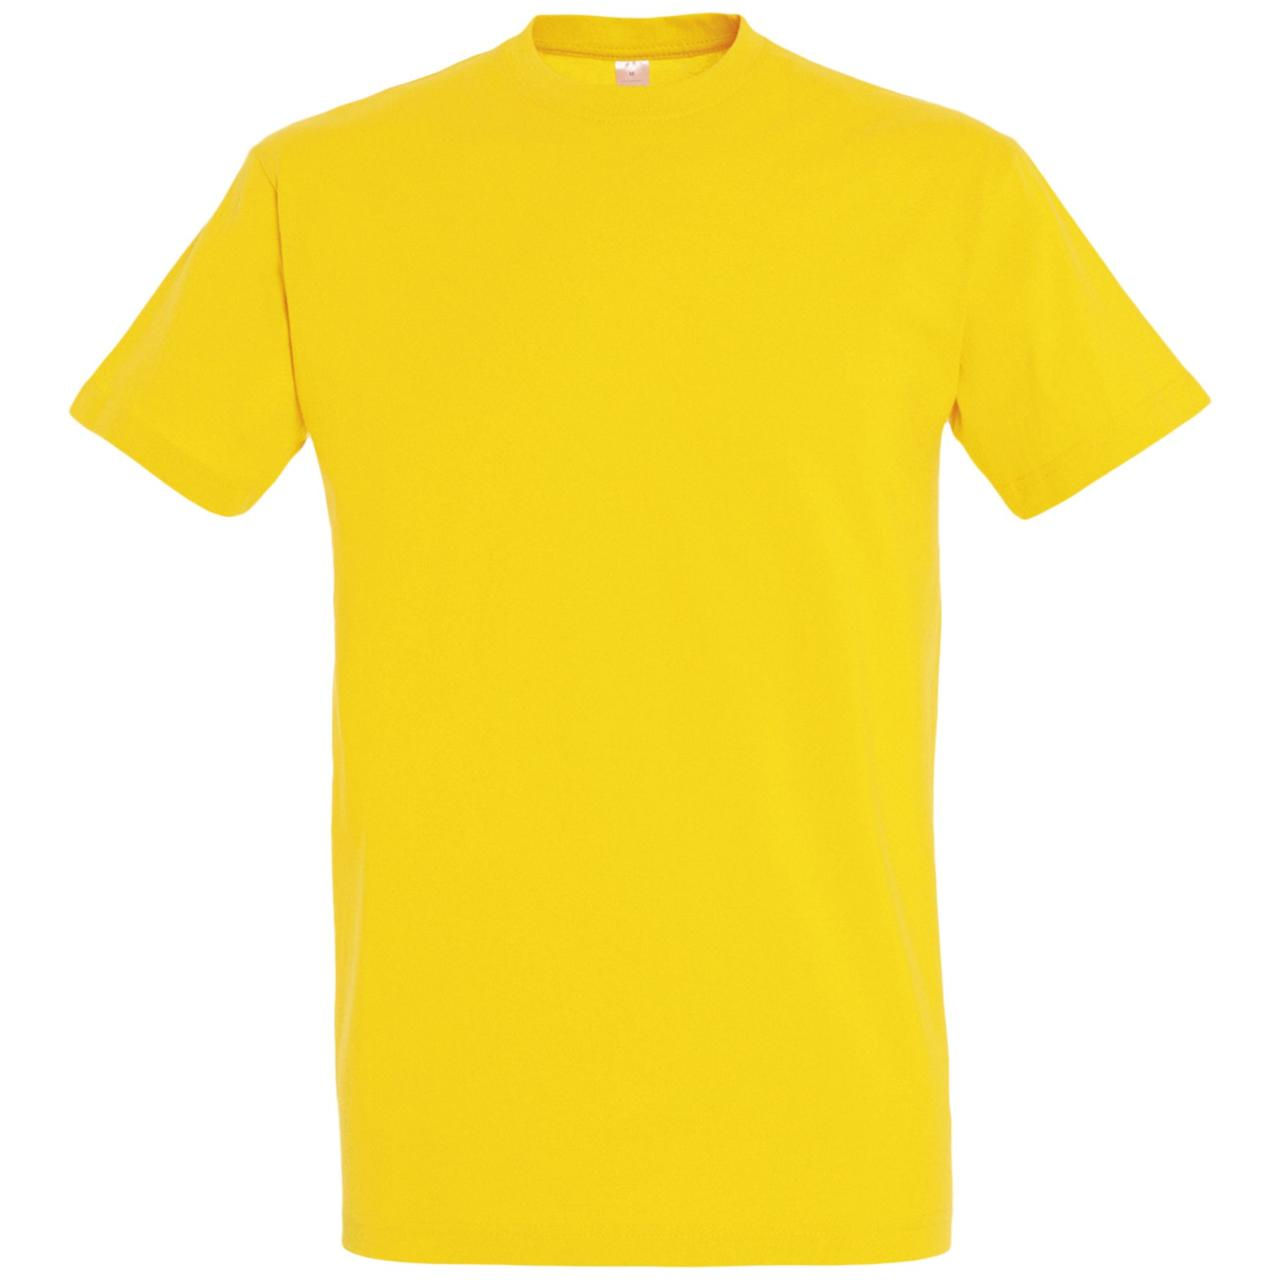 Oднотонная футболка | Желтая | 160 гр. | XS